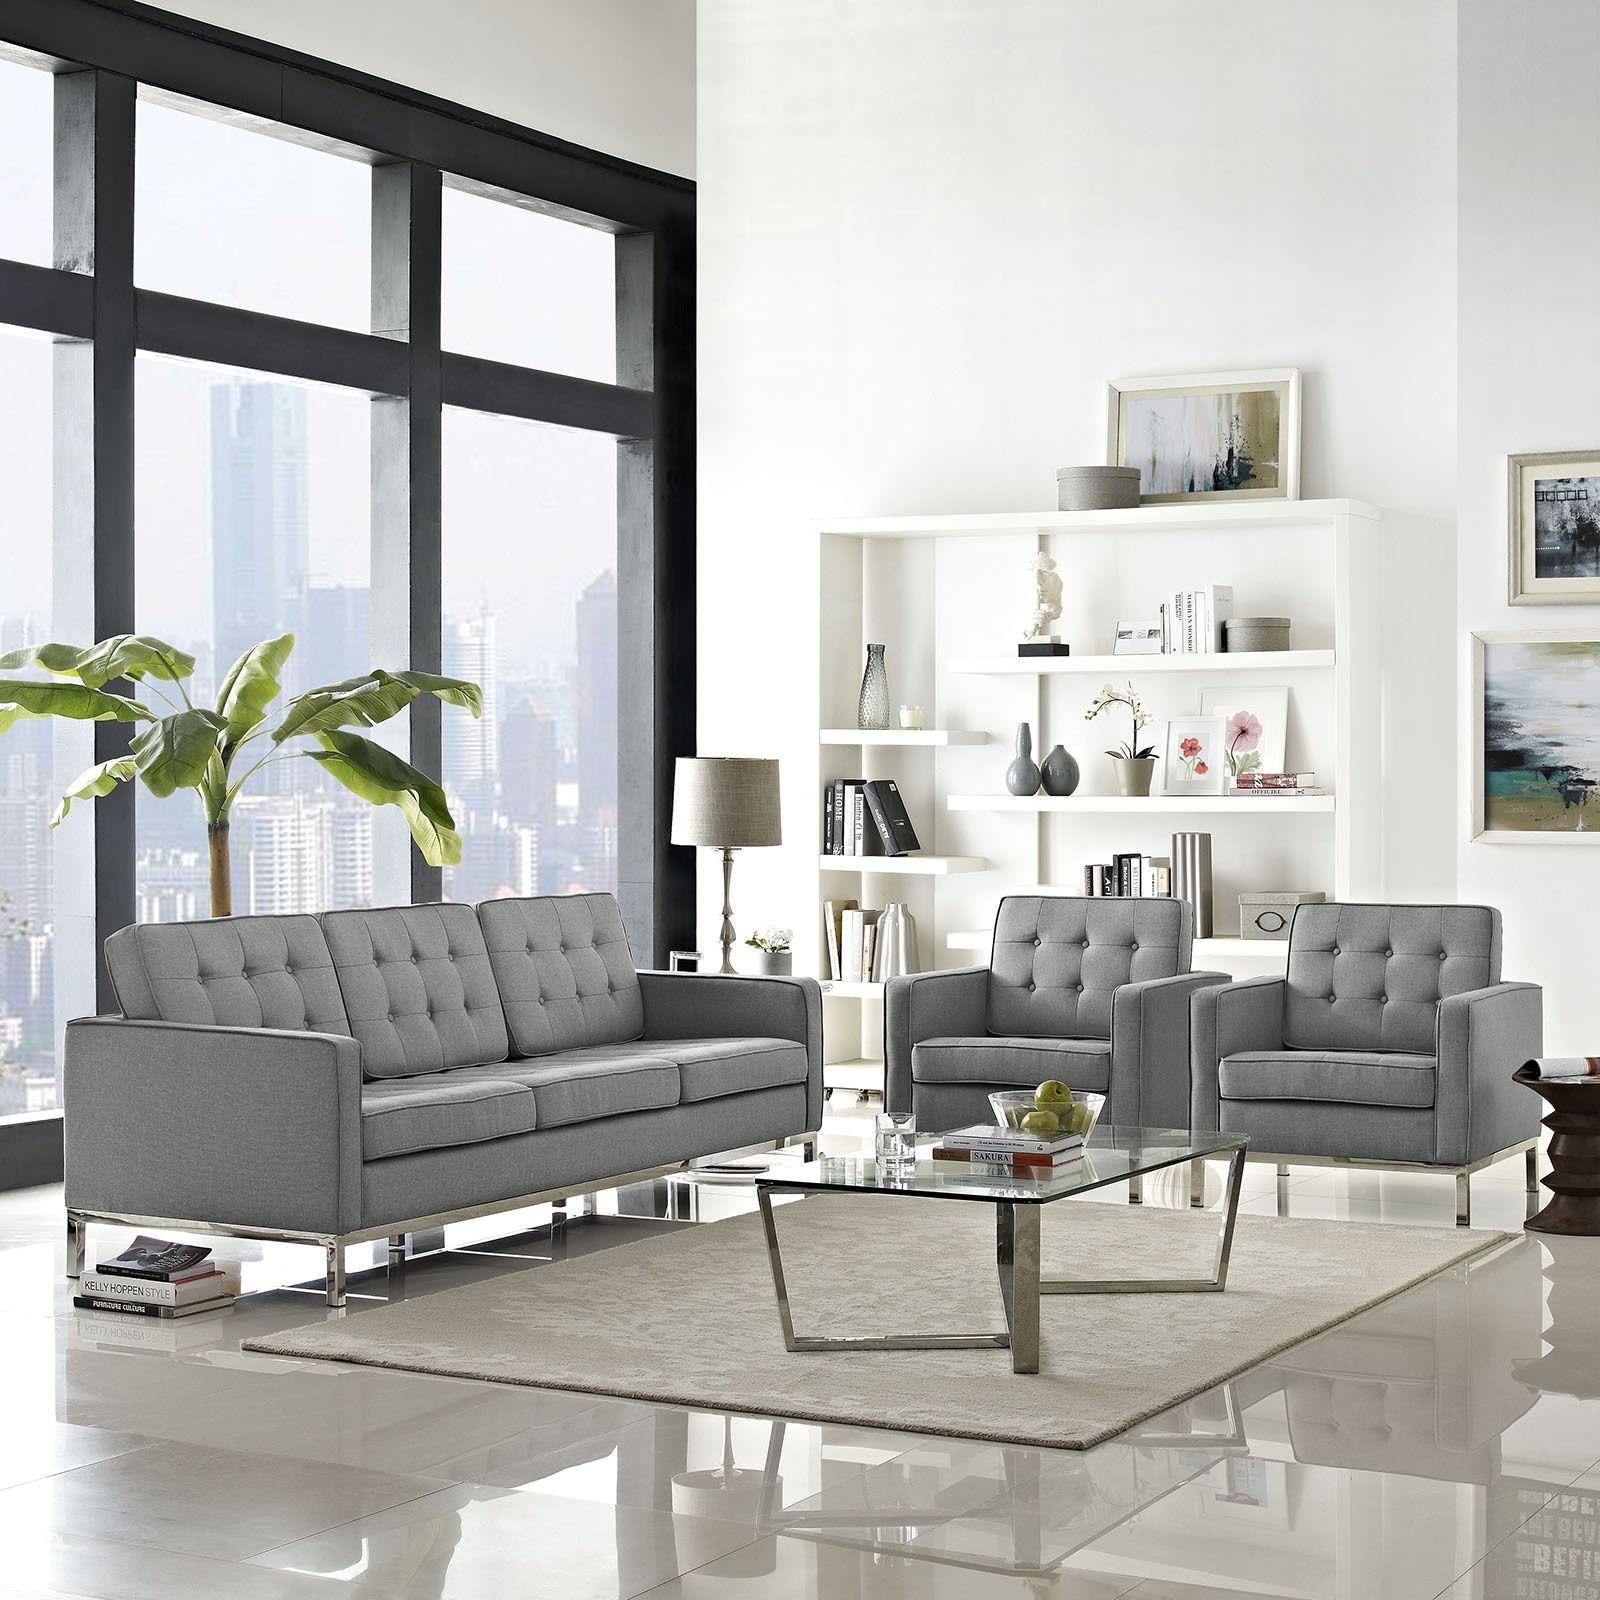 Modway Loft Living Room Set Fabric Set of 3 (Granite), Beige Off ...